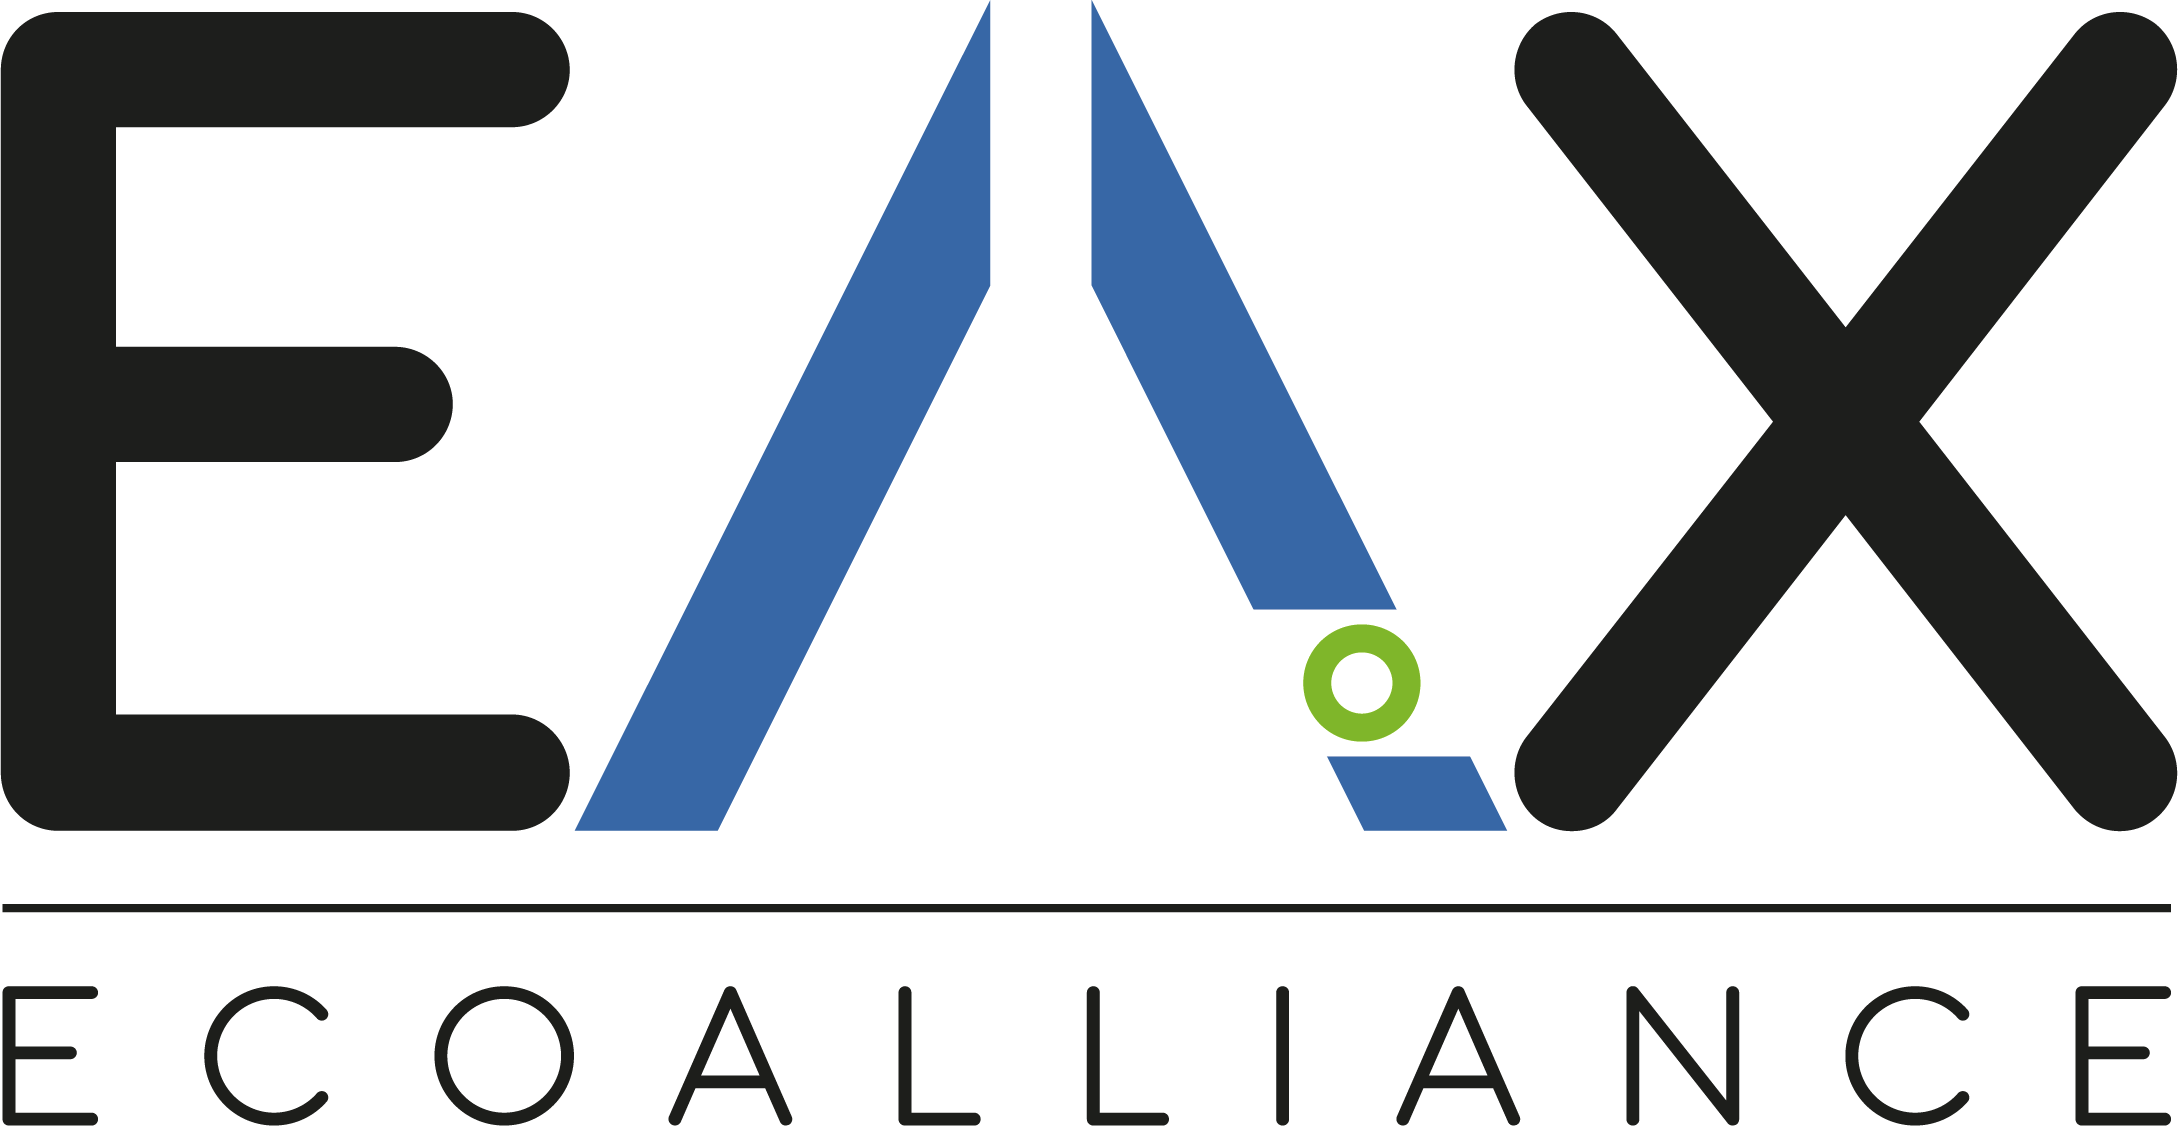 Empresas Desafio10x: EcoAlliance SpA